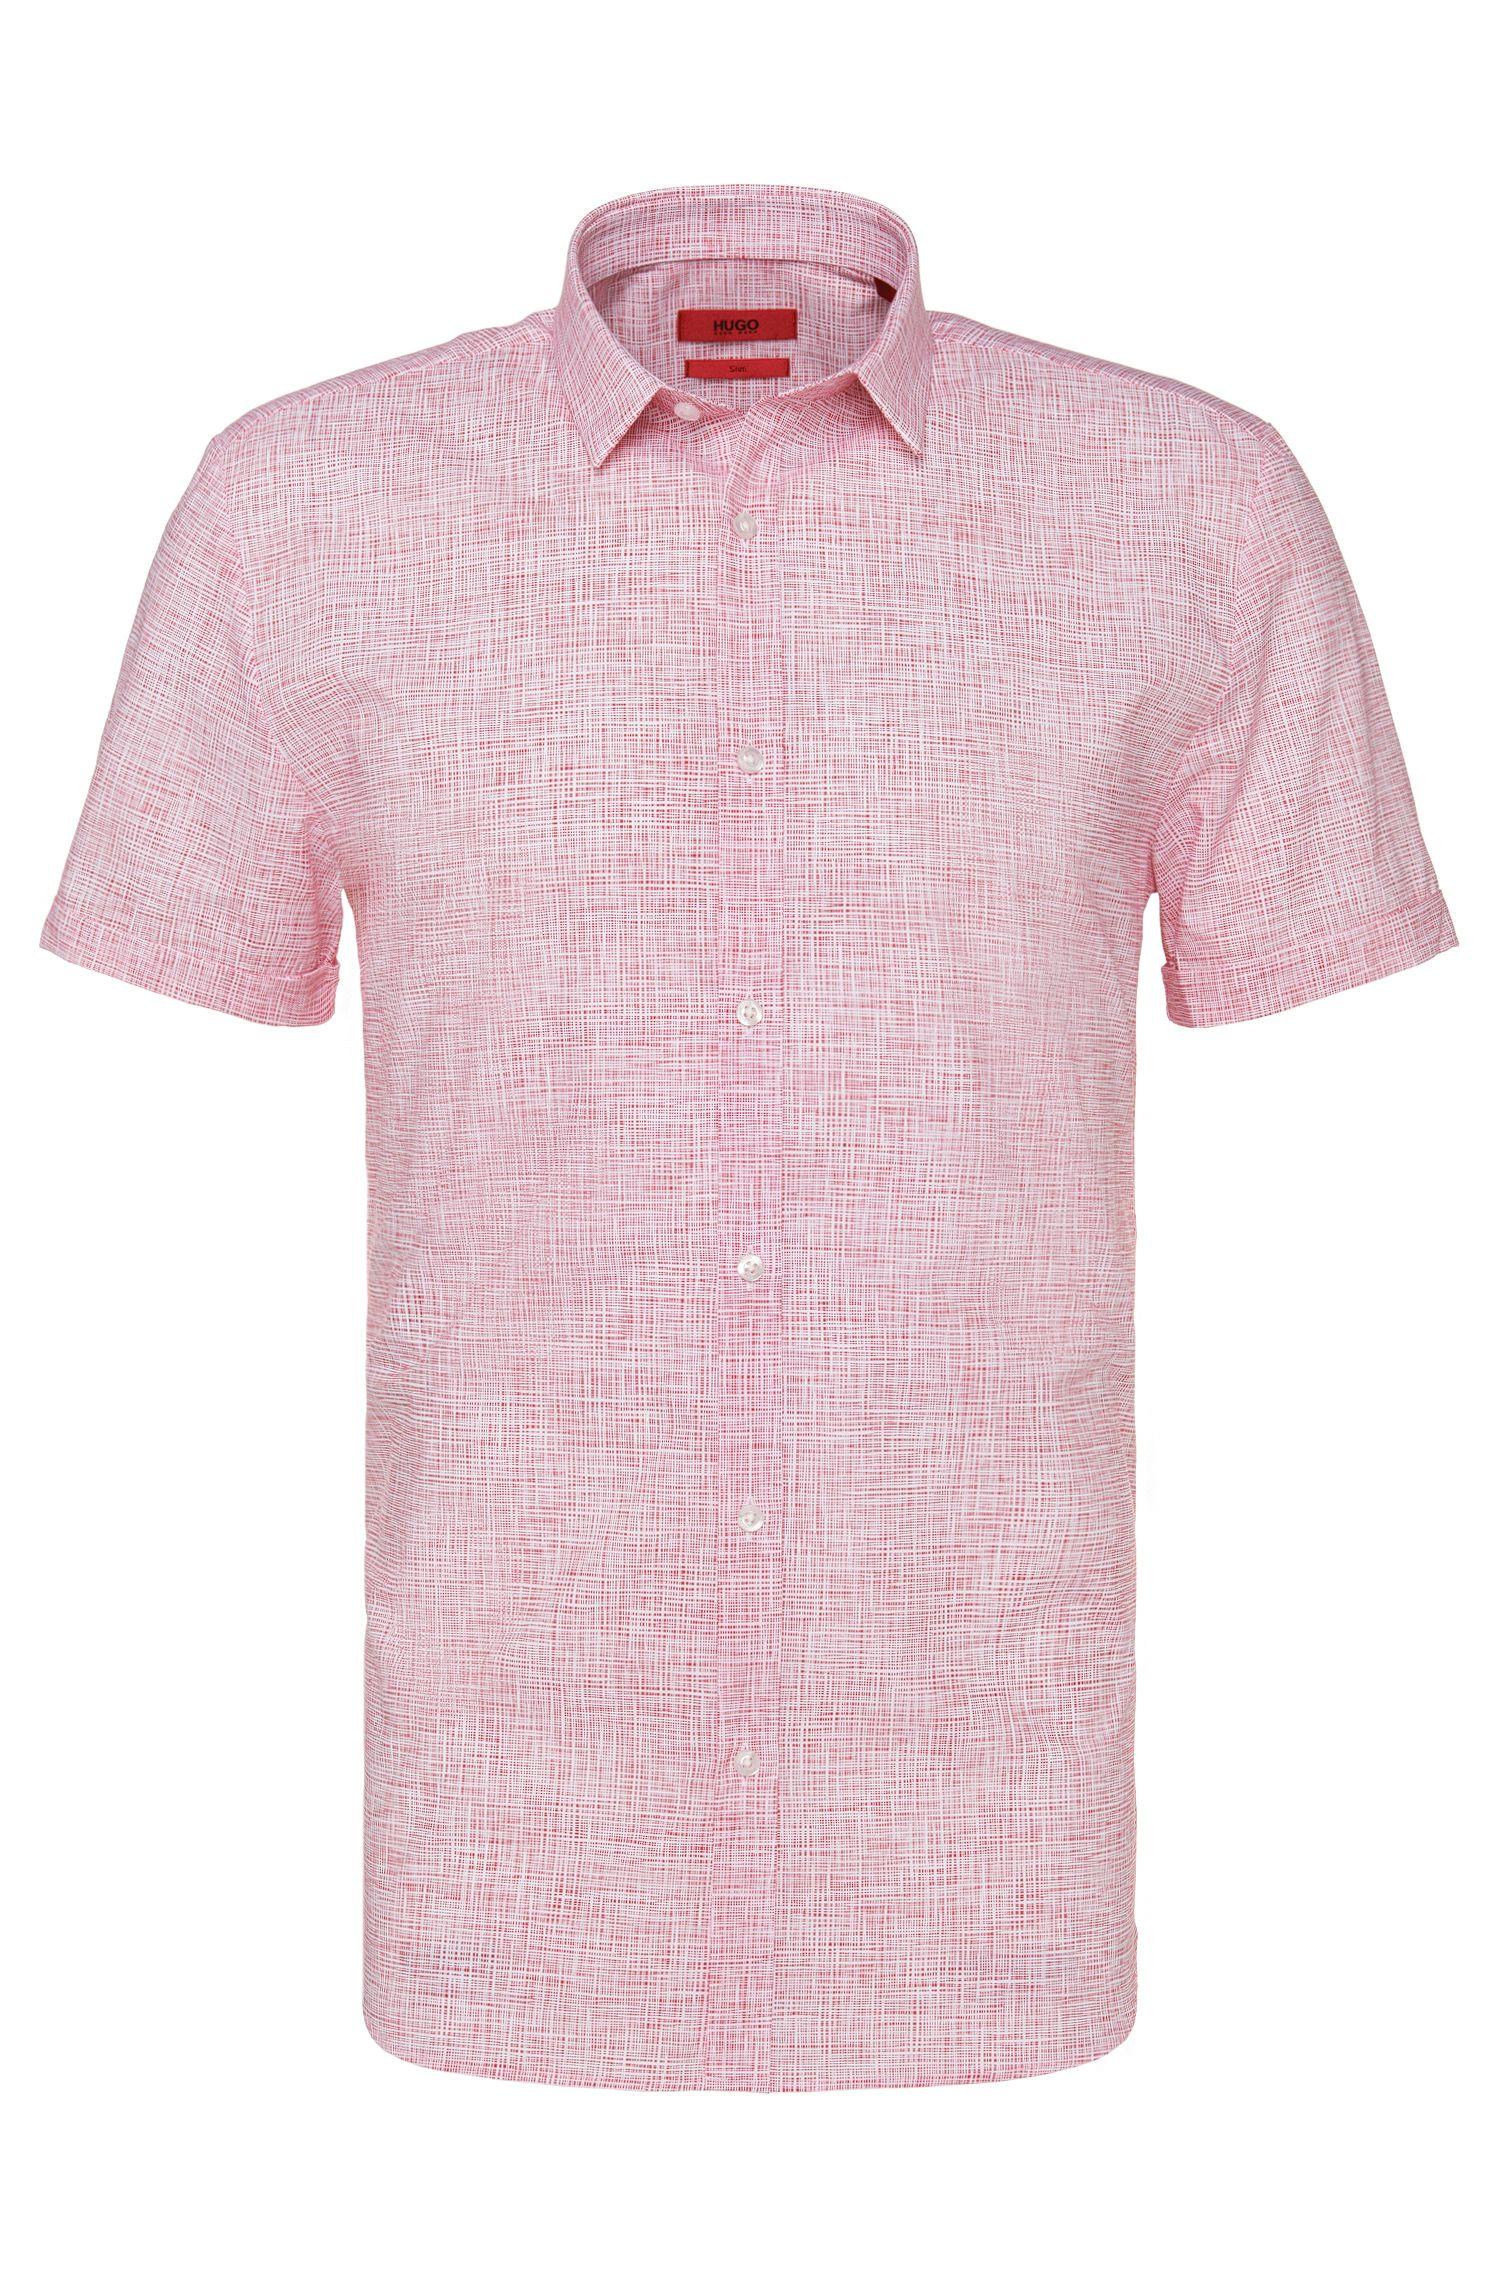 'Empson'   Slim Fit, Cotton Printed Button Down Shirt